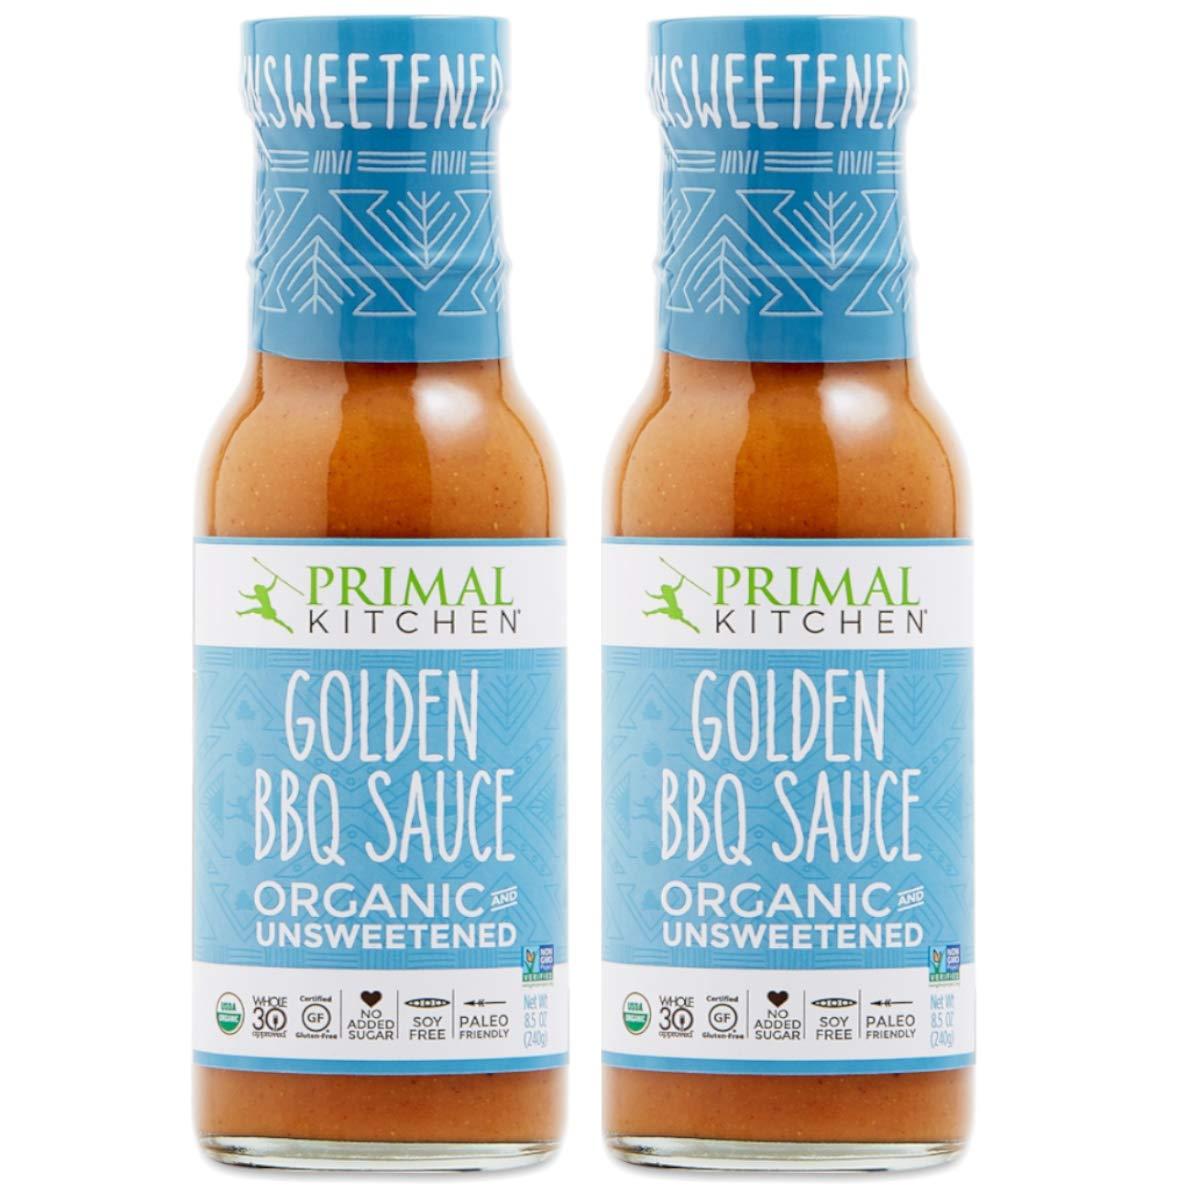 Image of Primal Kitchen golden BBQ sauce